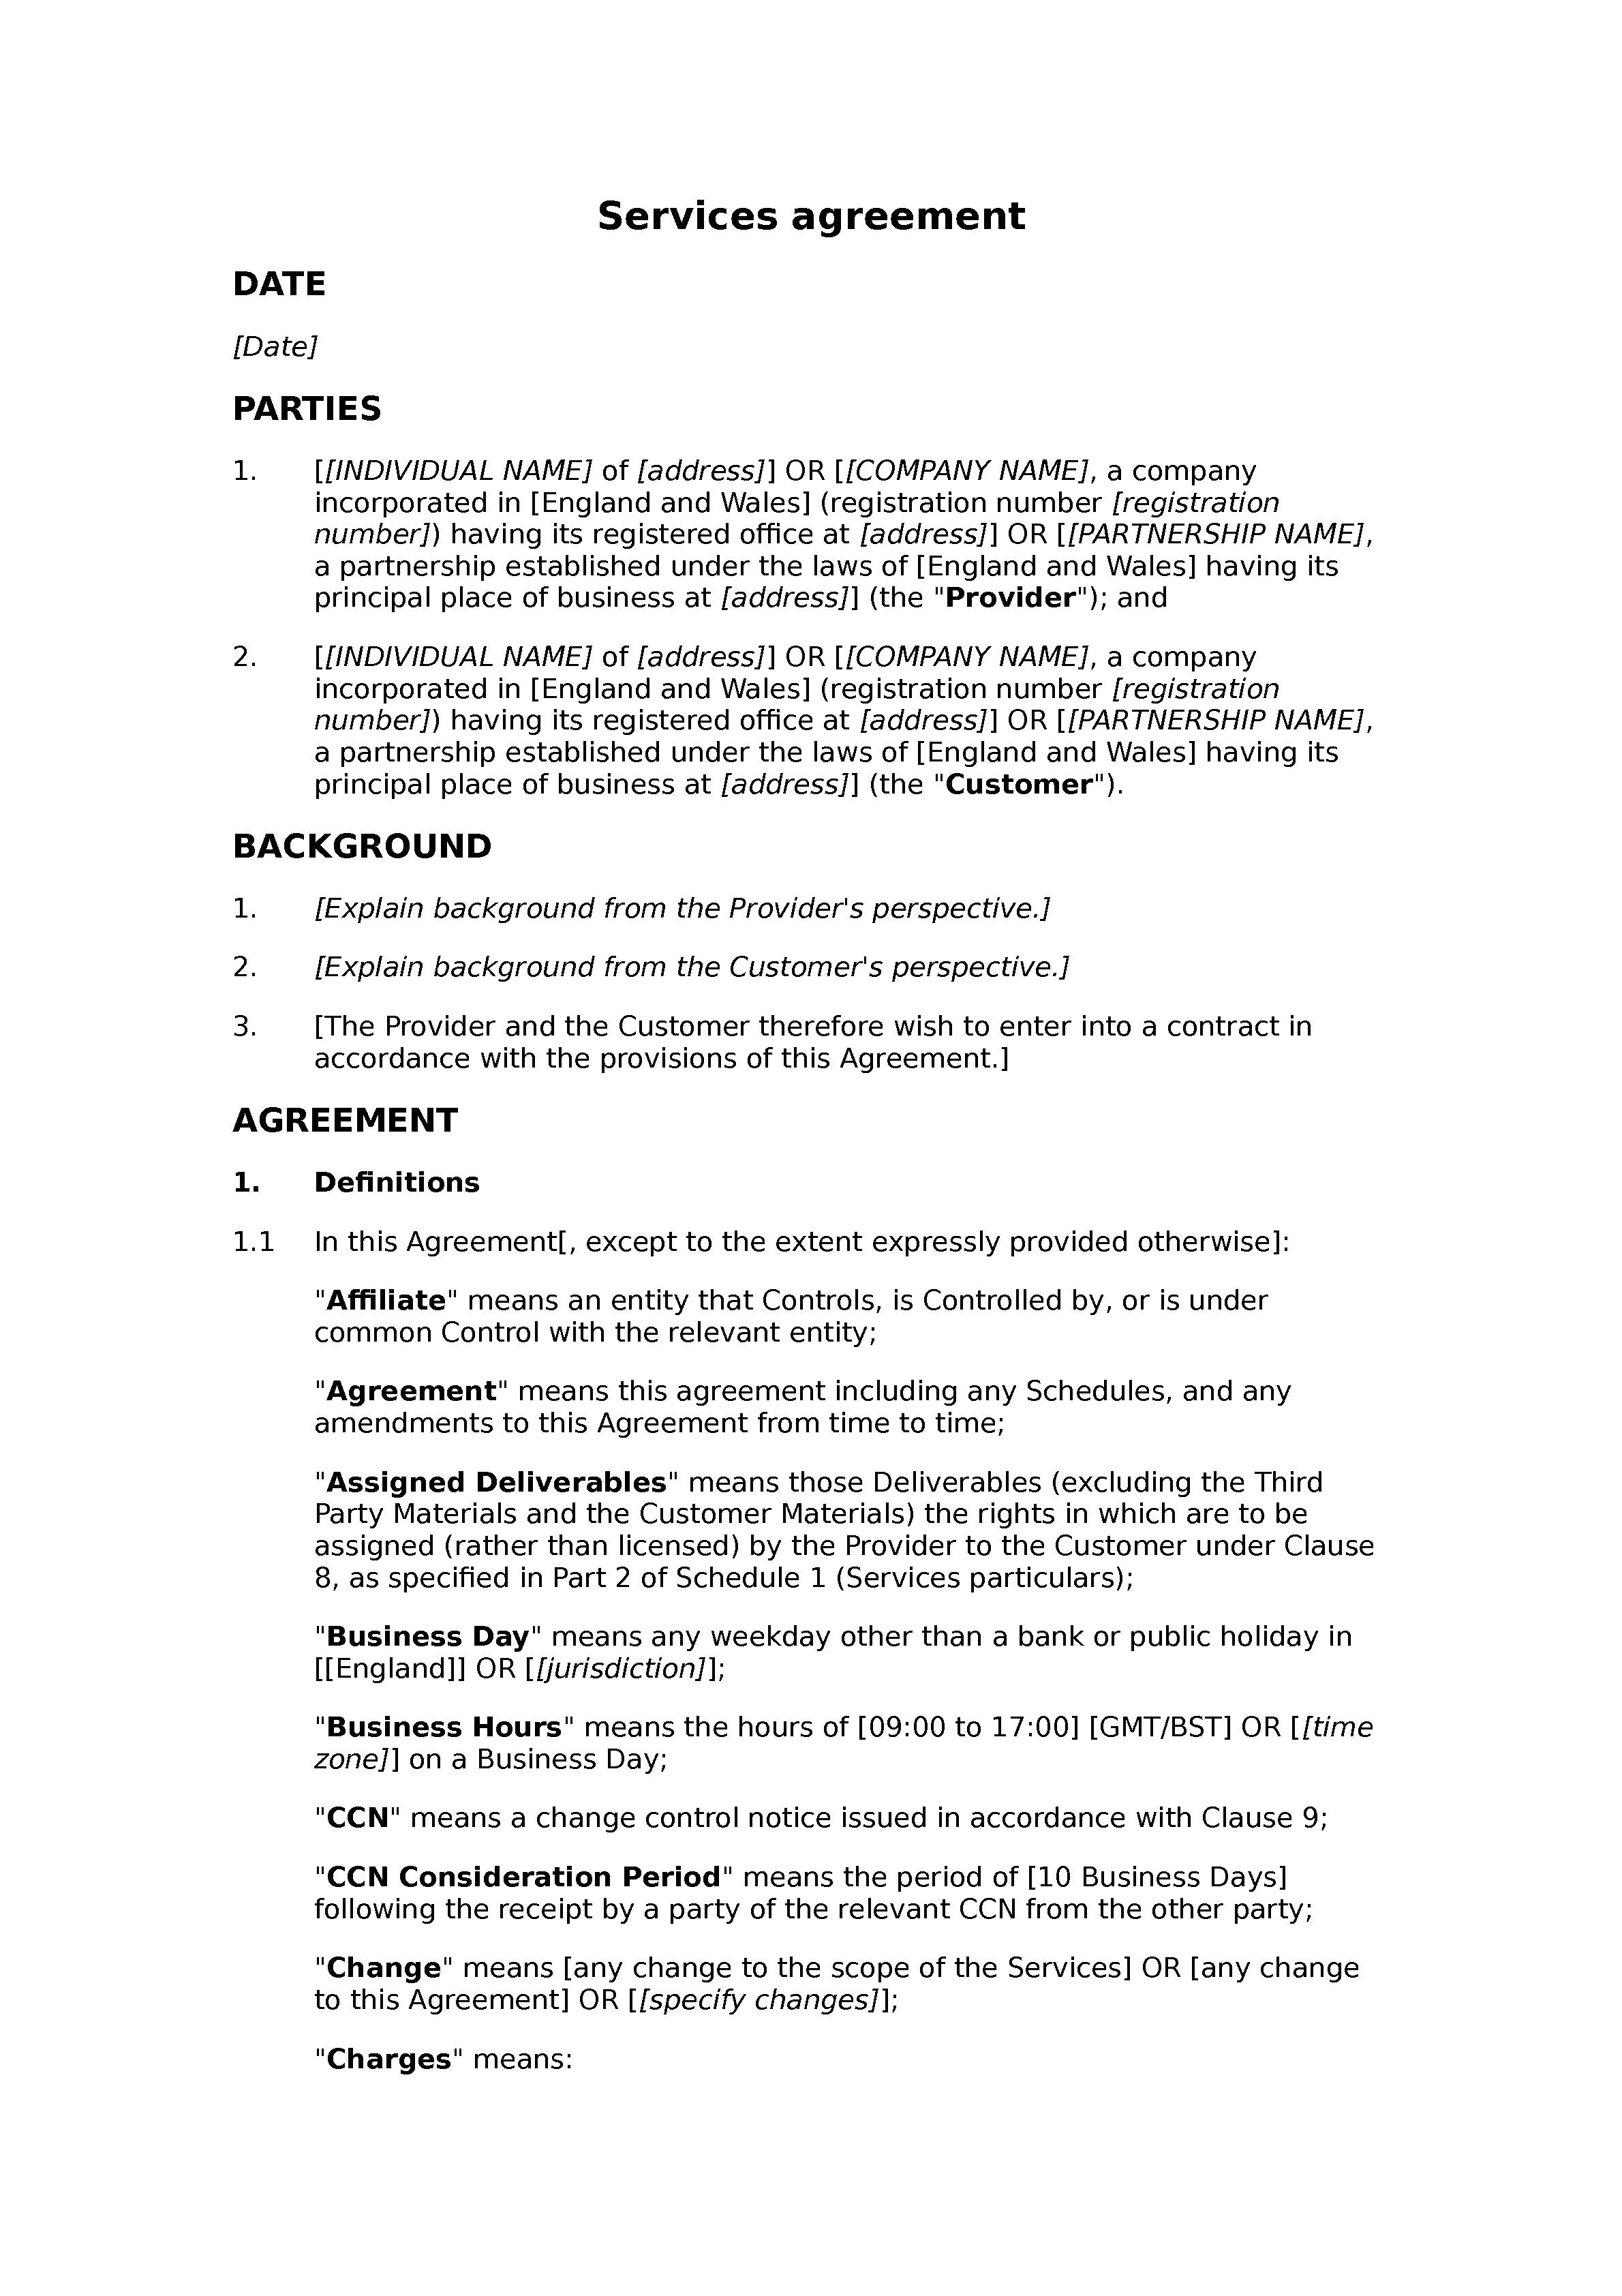 Services agreement (premium) document preview